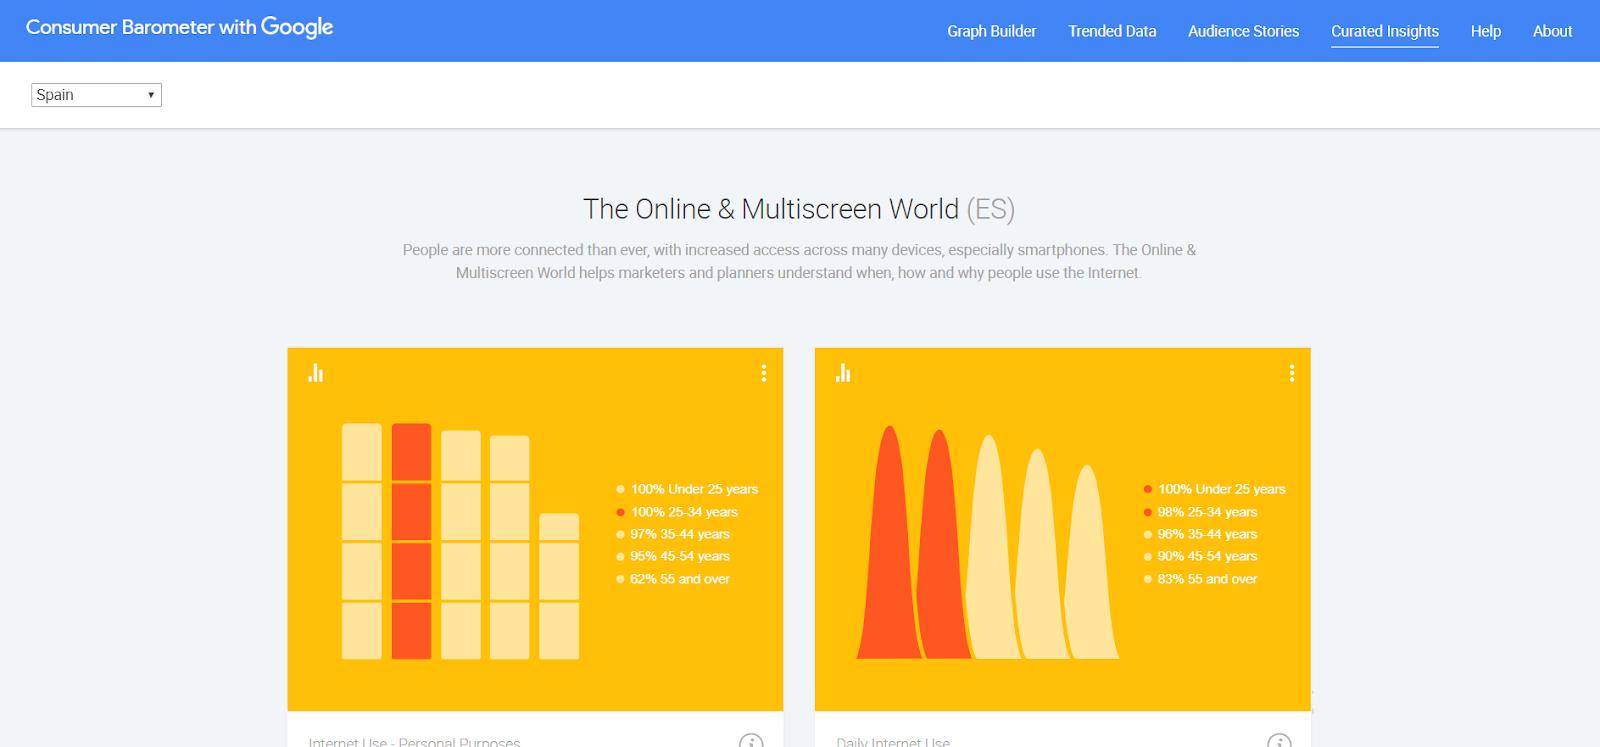 herramientas posicionamiento seo internacional google barometer